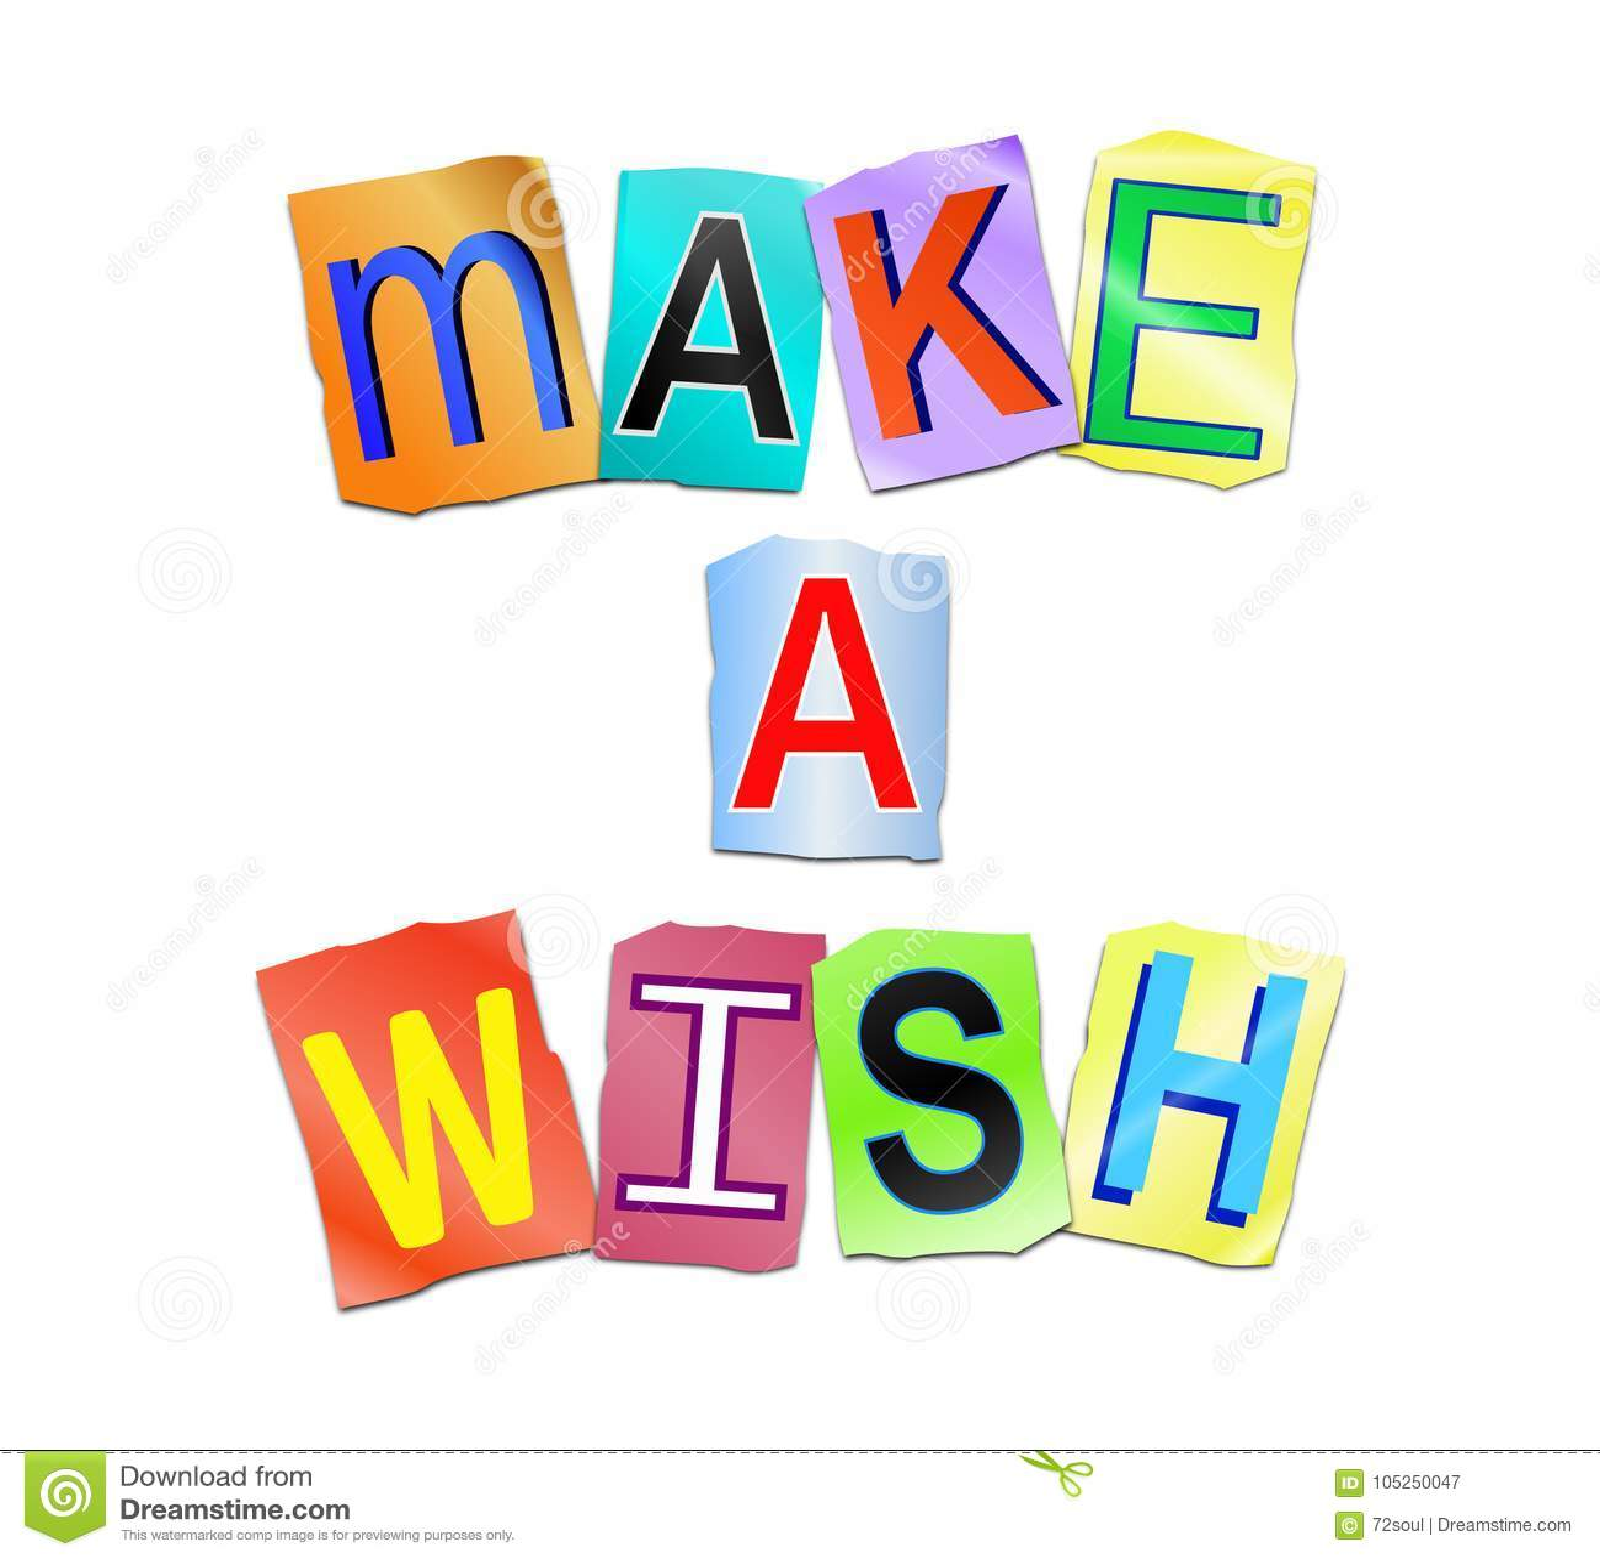 Make a wish concept  stock illustration  Illustration of